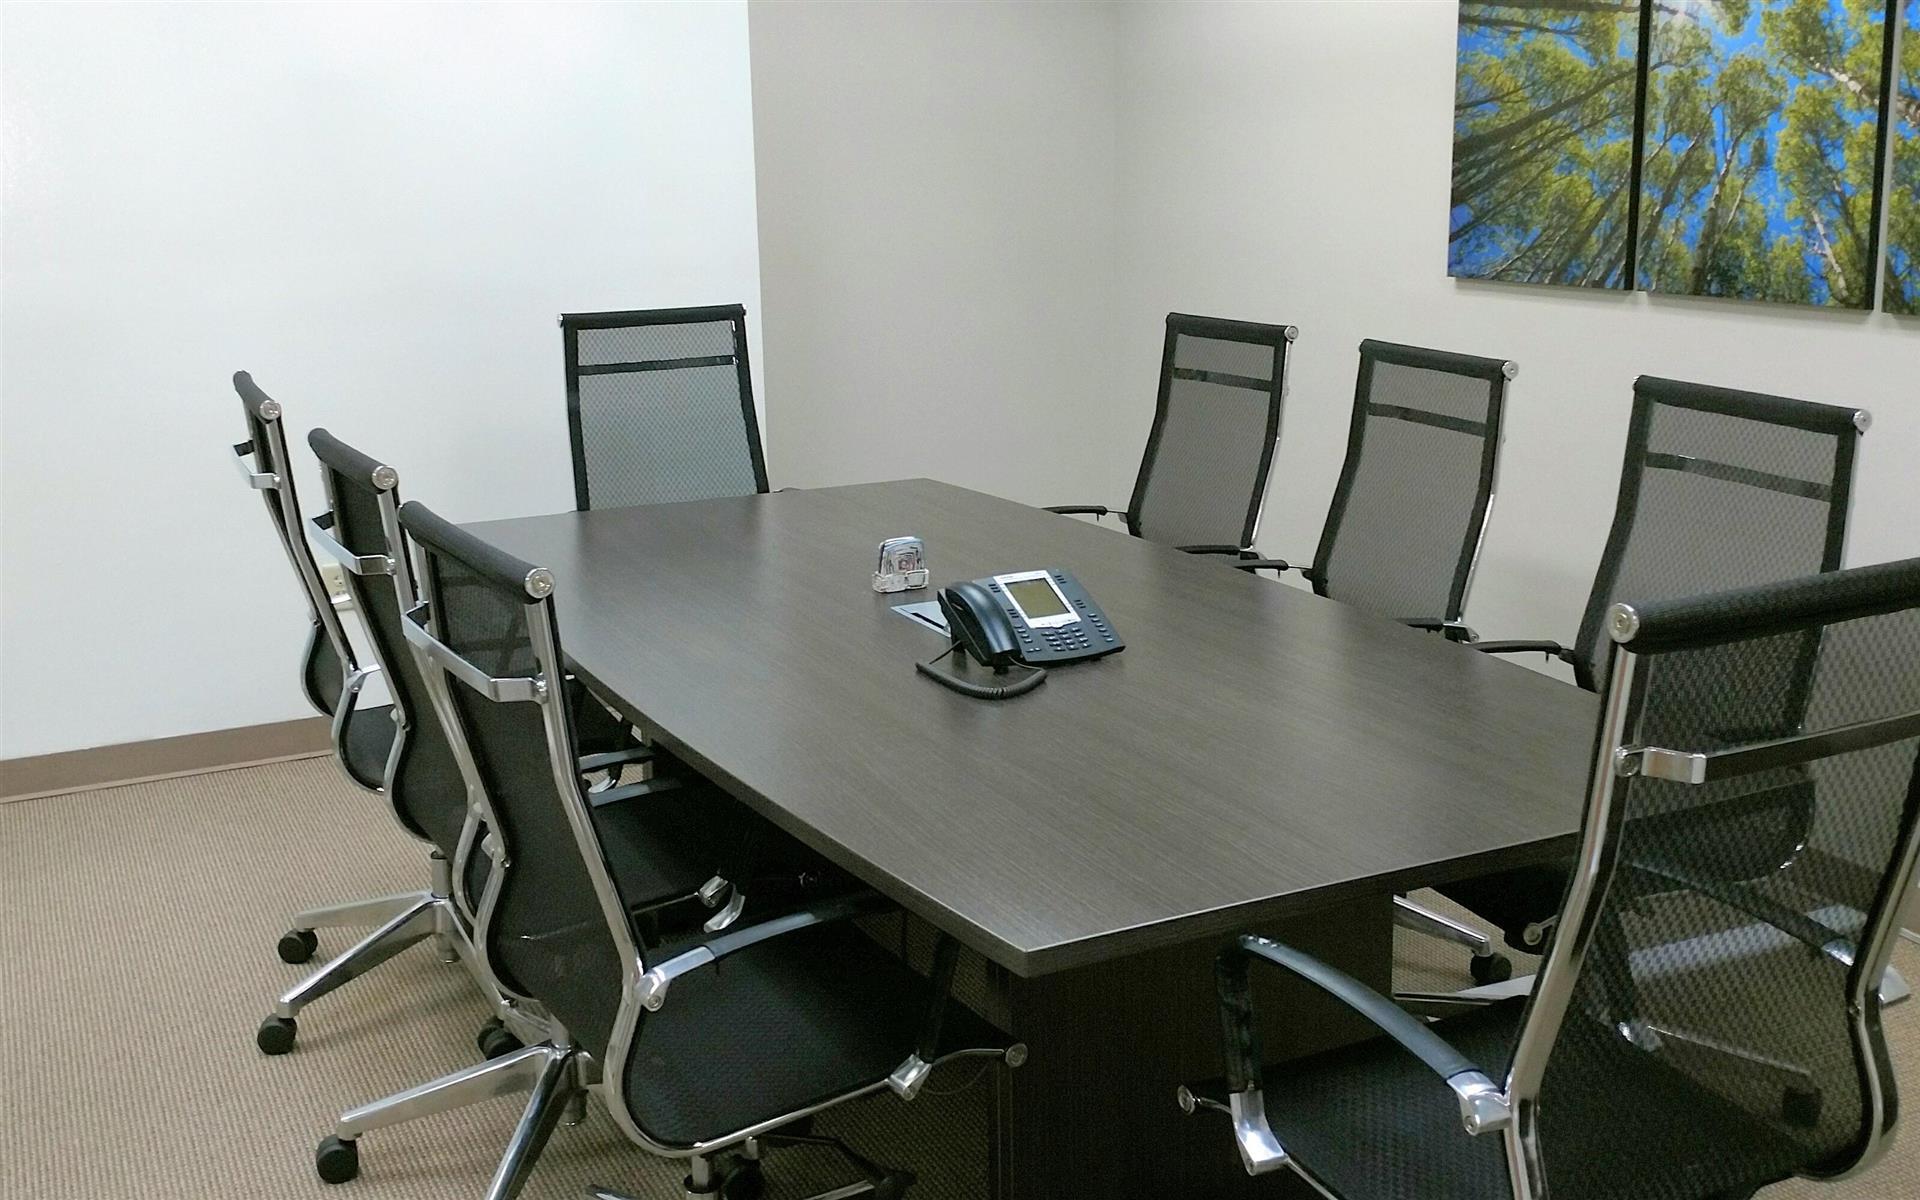 Focus Strategies - Suite 120 - Conference Room 9